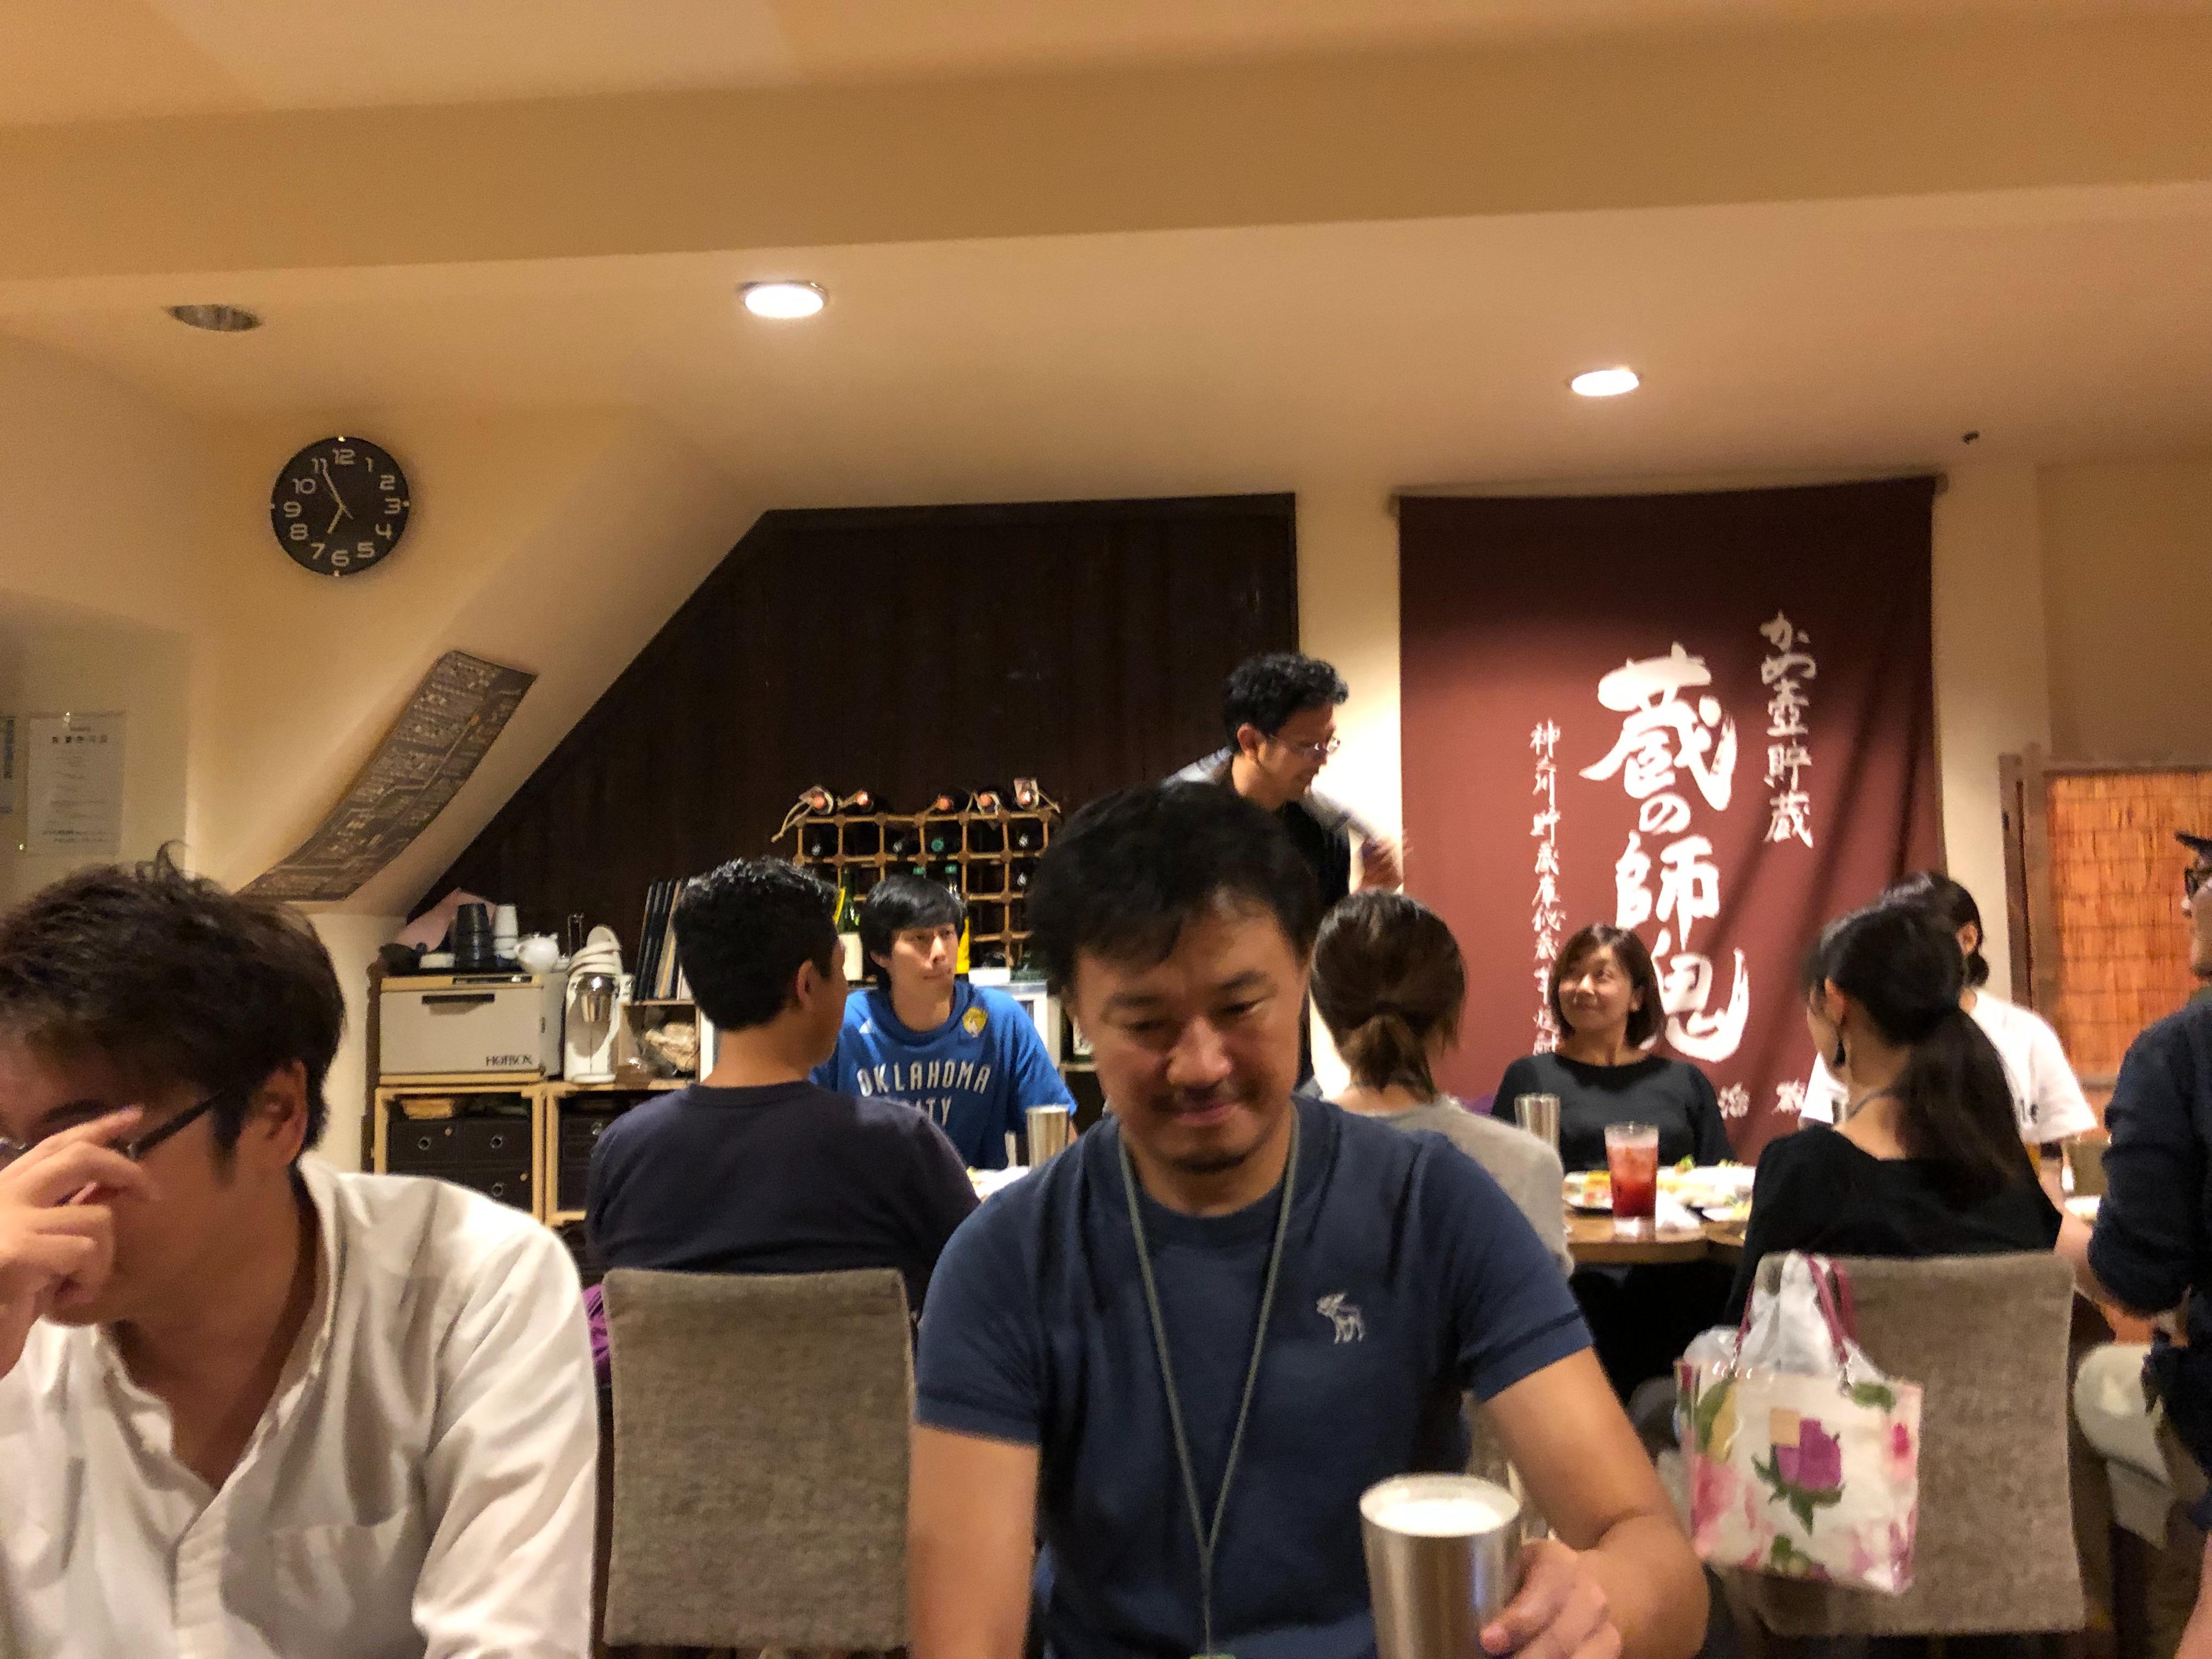 f:id:masanori-kato1972:20190830215858j:image